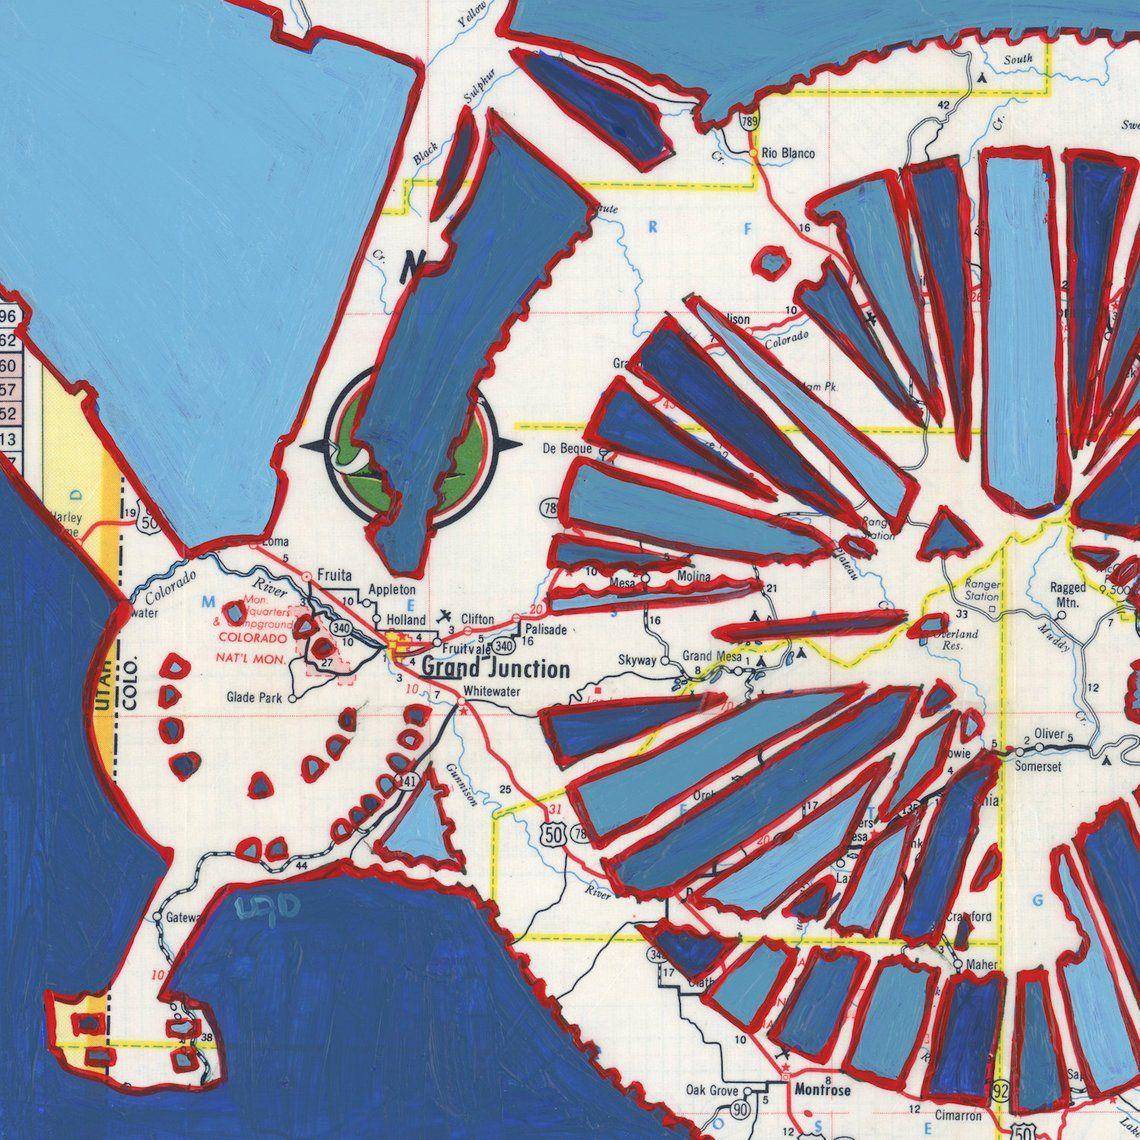 Bike Grand Junction Print Featuring Fruita Fruitvale Grand